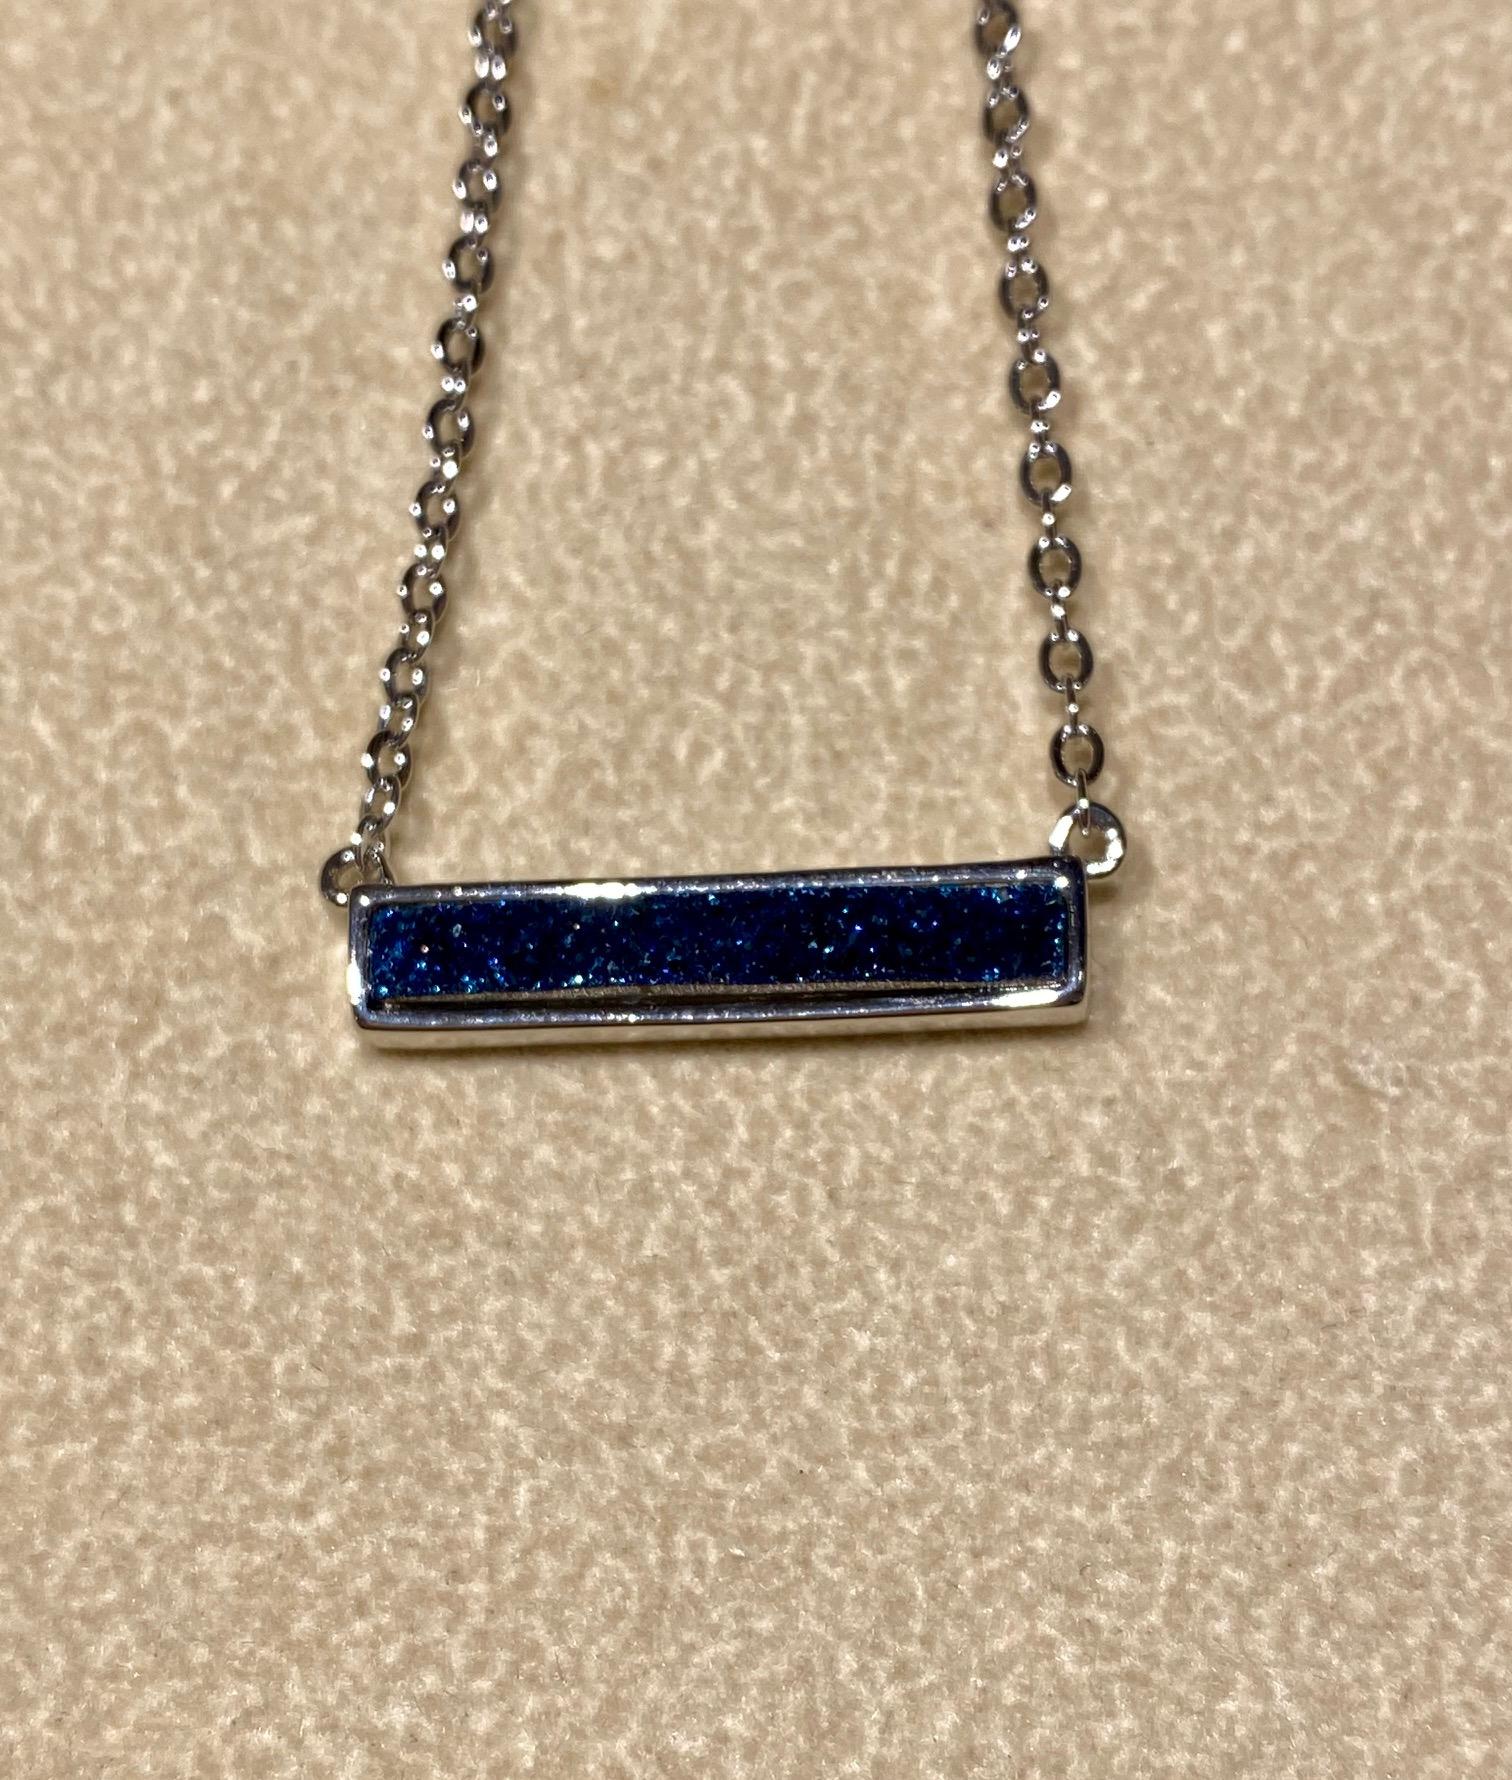 Blue Druzy in Silver Necklace 18